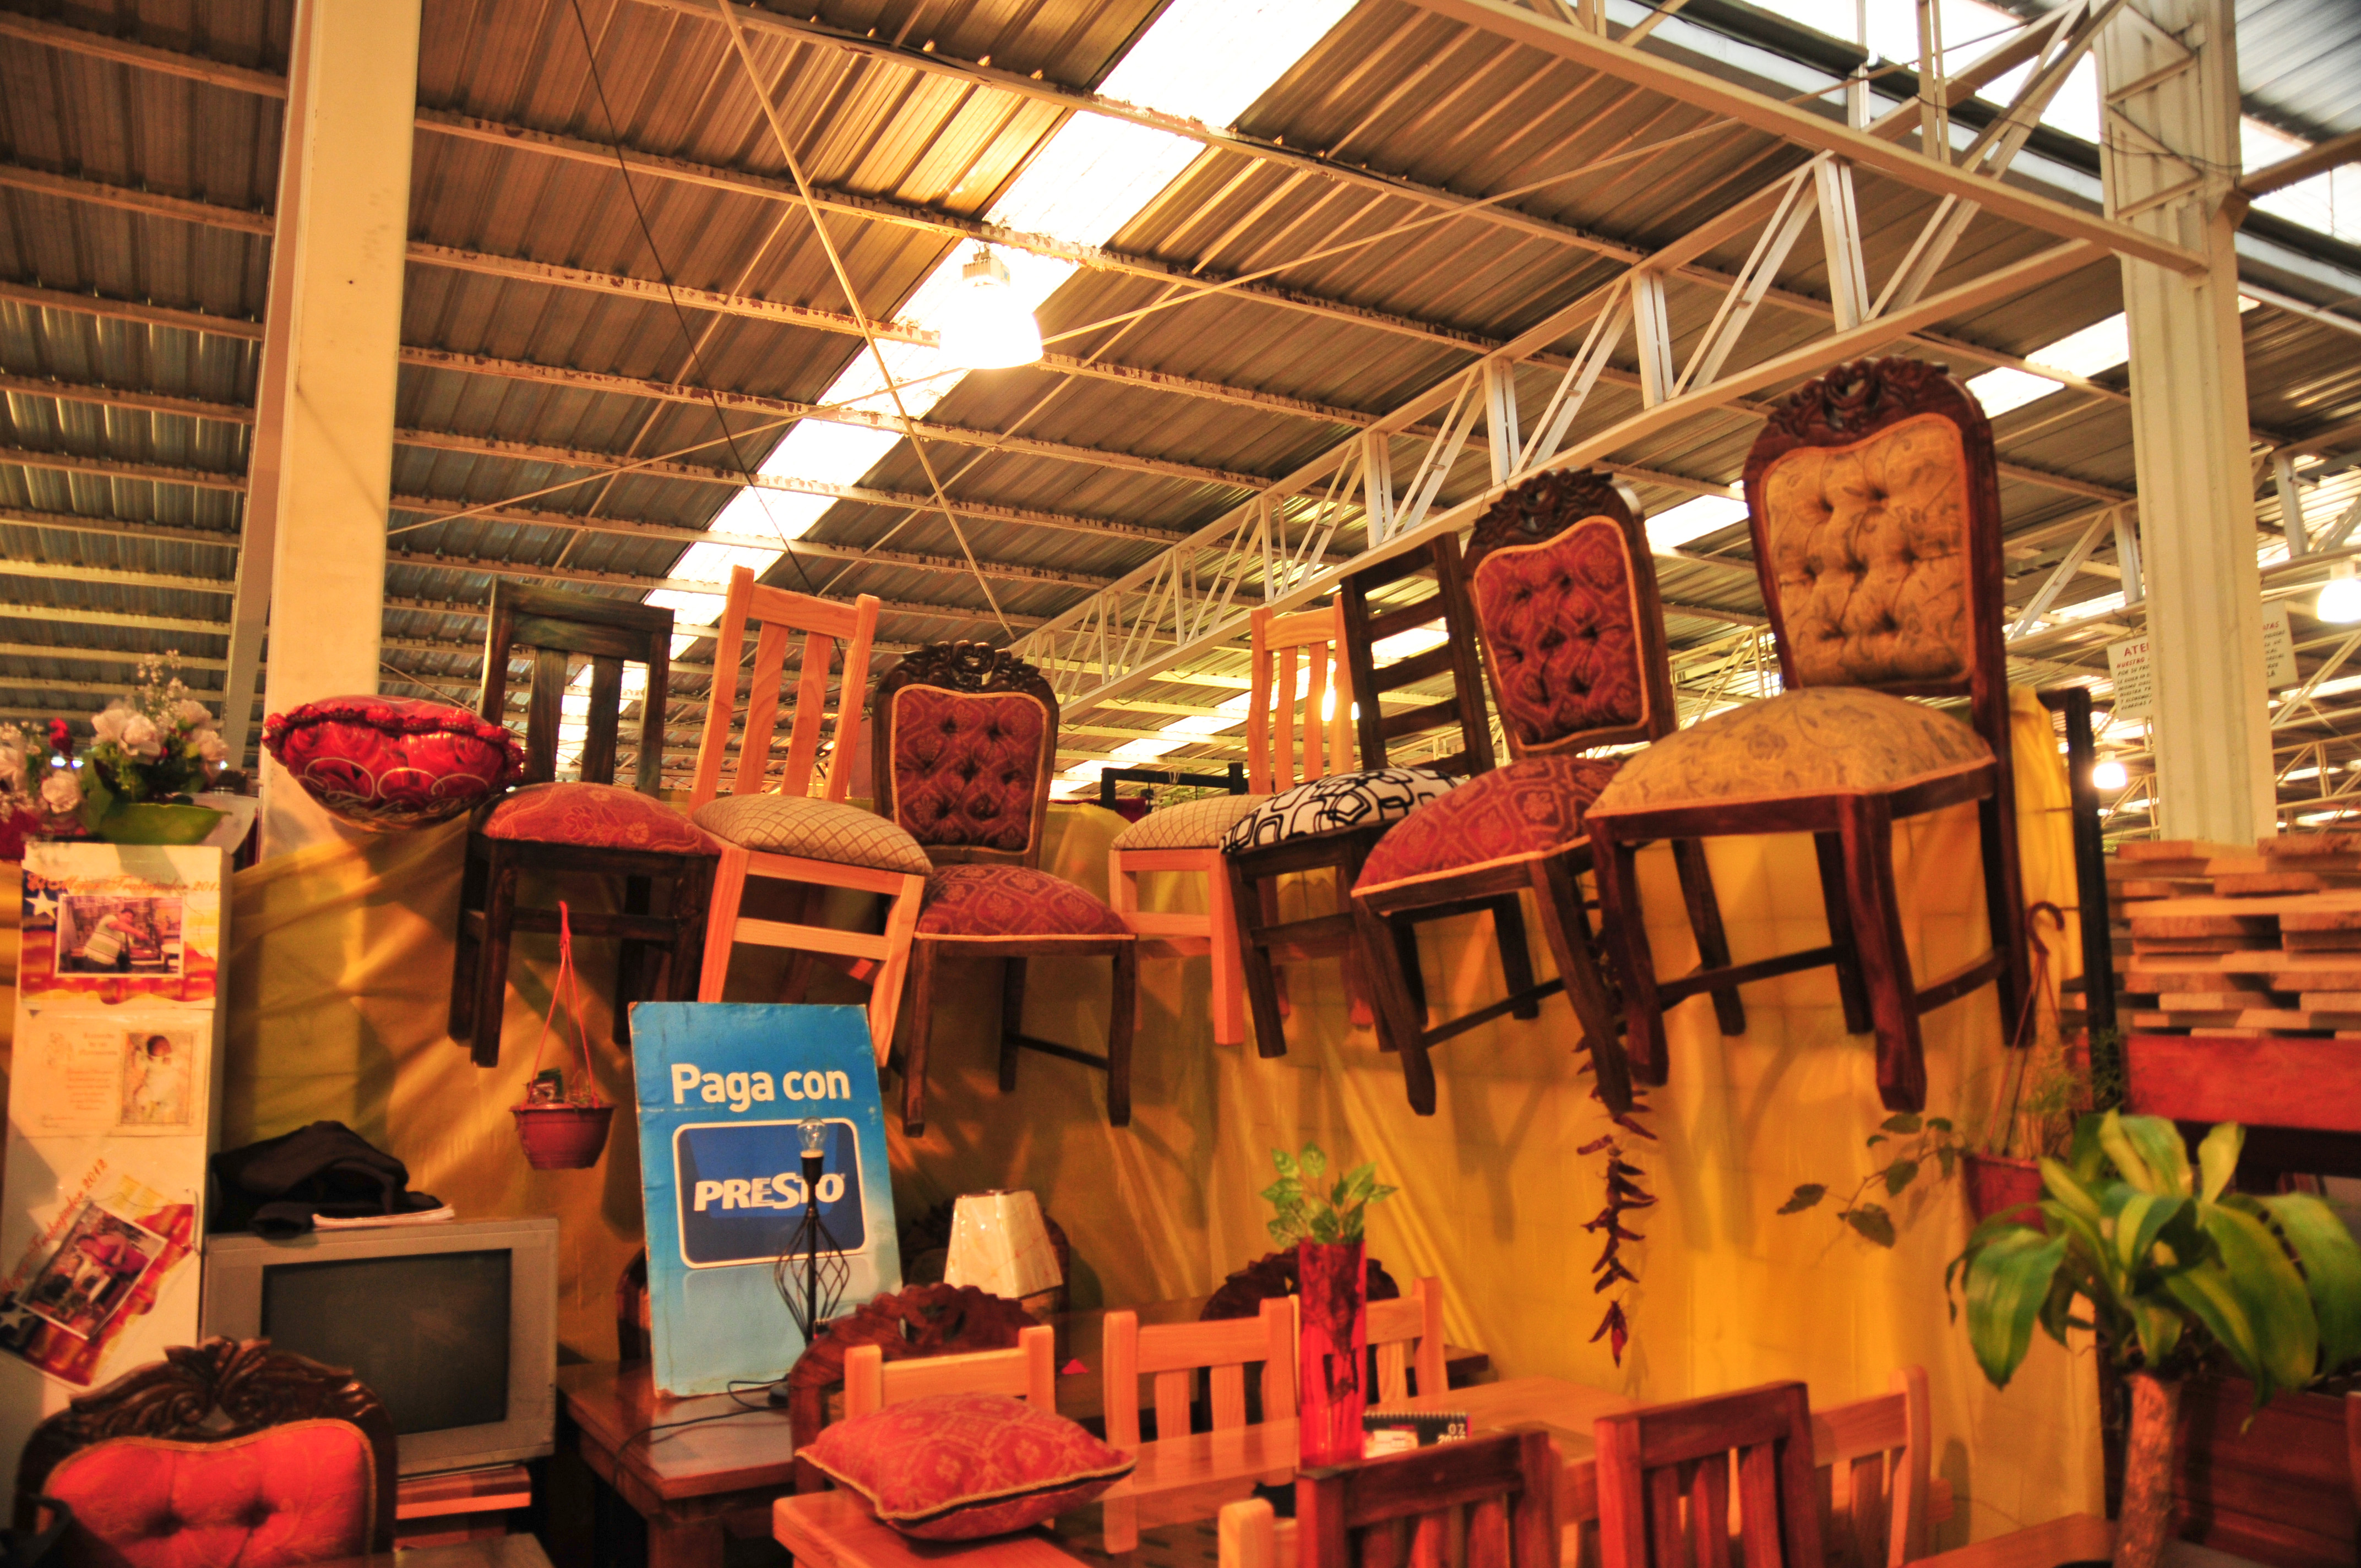 Tpm 0317 plataforma urbana for Comedores baratos en santiago